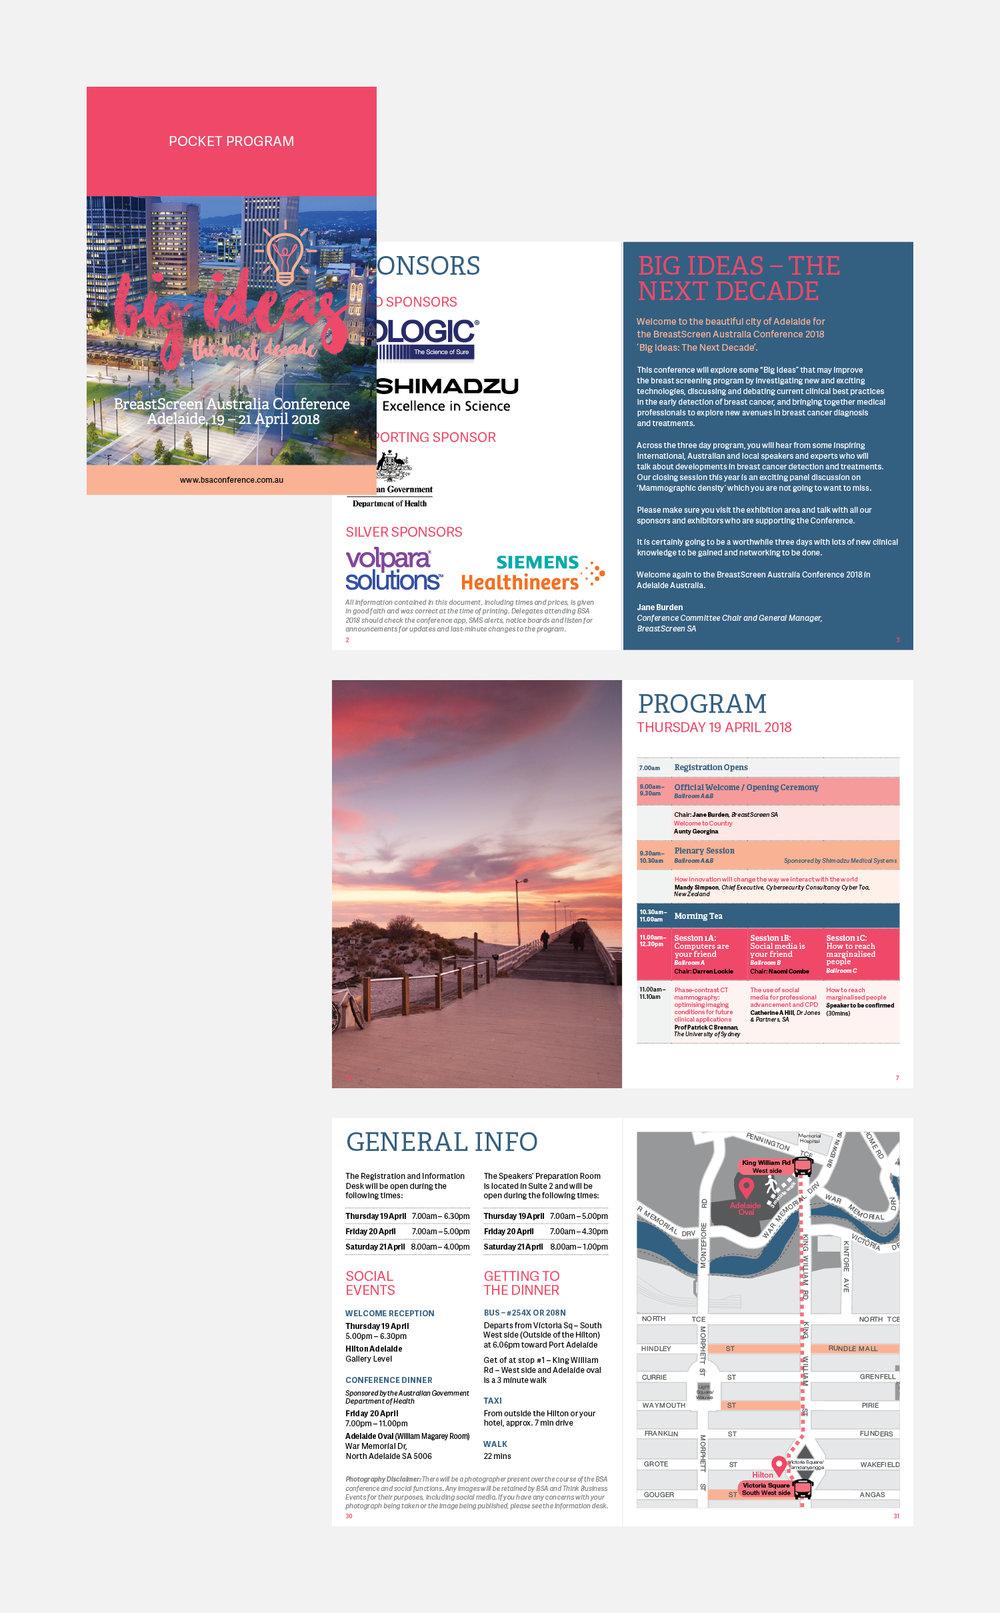 Gray+Design+BreastScreenAust+Conference+Program-3.jpg